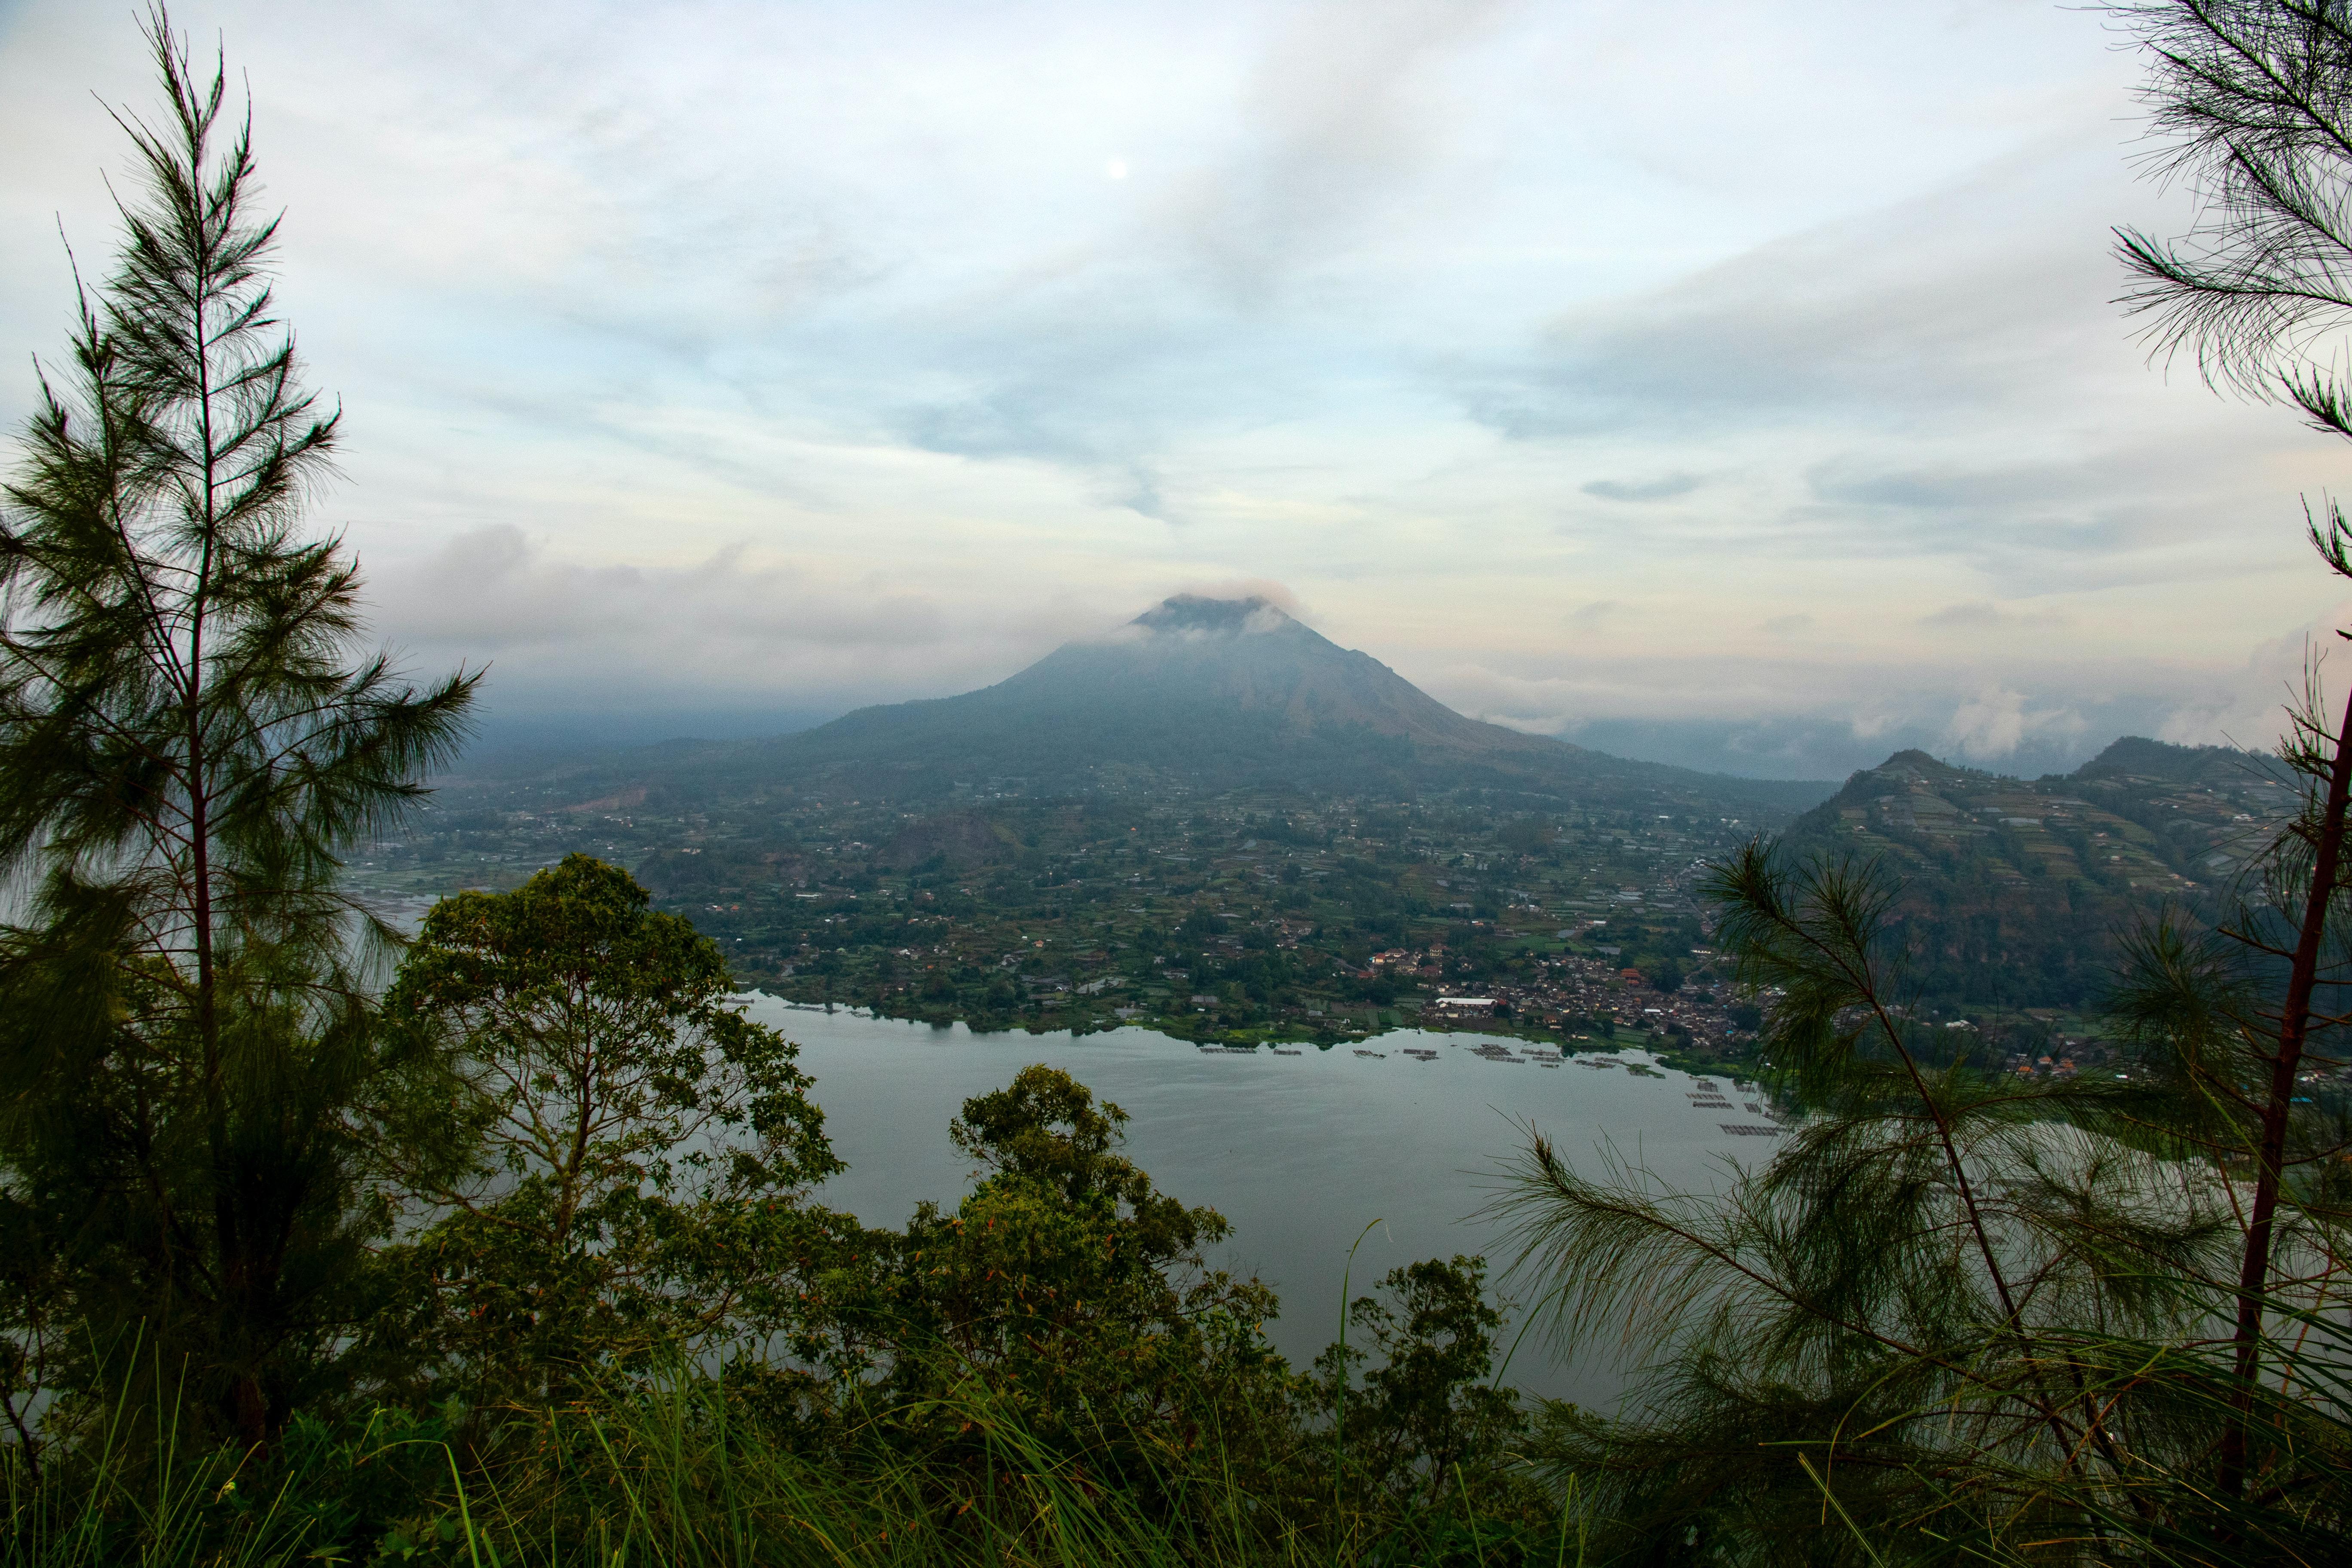 Lake Batur, South Batur, Bangli Regency, Bali, Indonesia, Plan your Bali Honeymoon from India